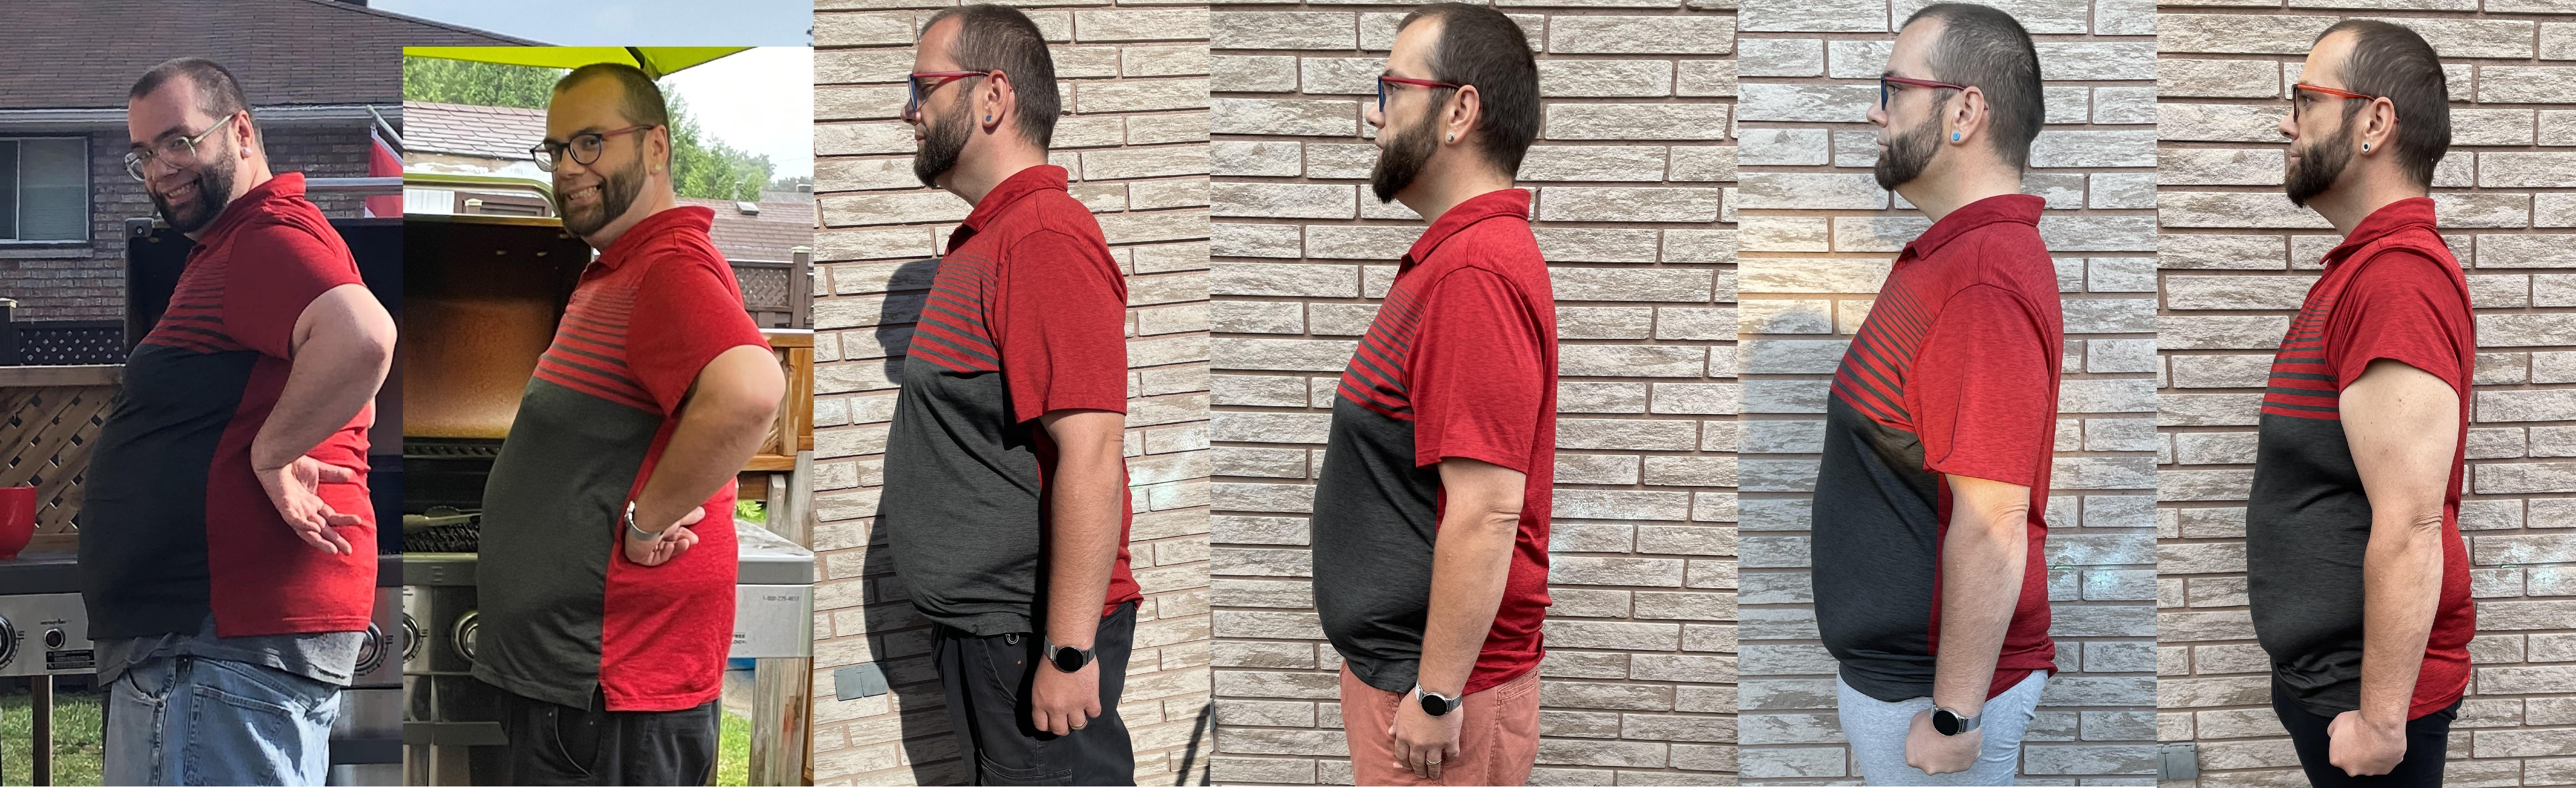 80 lbs Fat Loss 5 foot 10 Male 299 lbs to 219 lbs